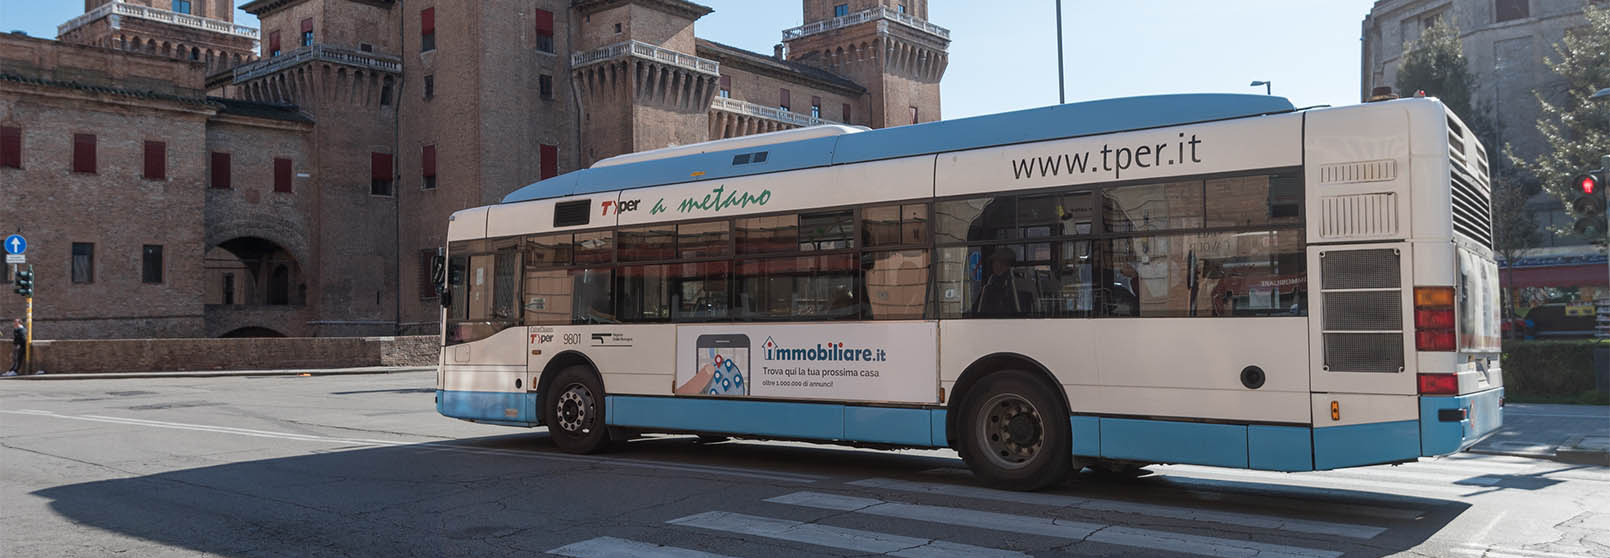 Immobiliare.it 300x70 Ferrara prima campagna ooh @IGPDecaux